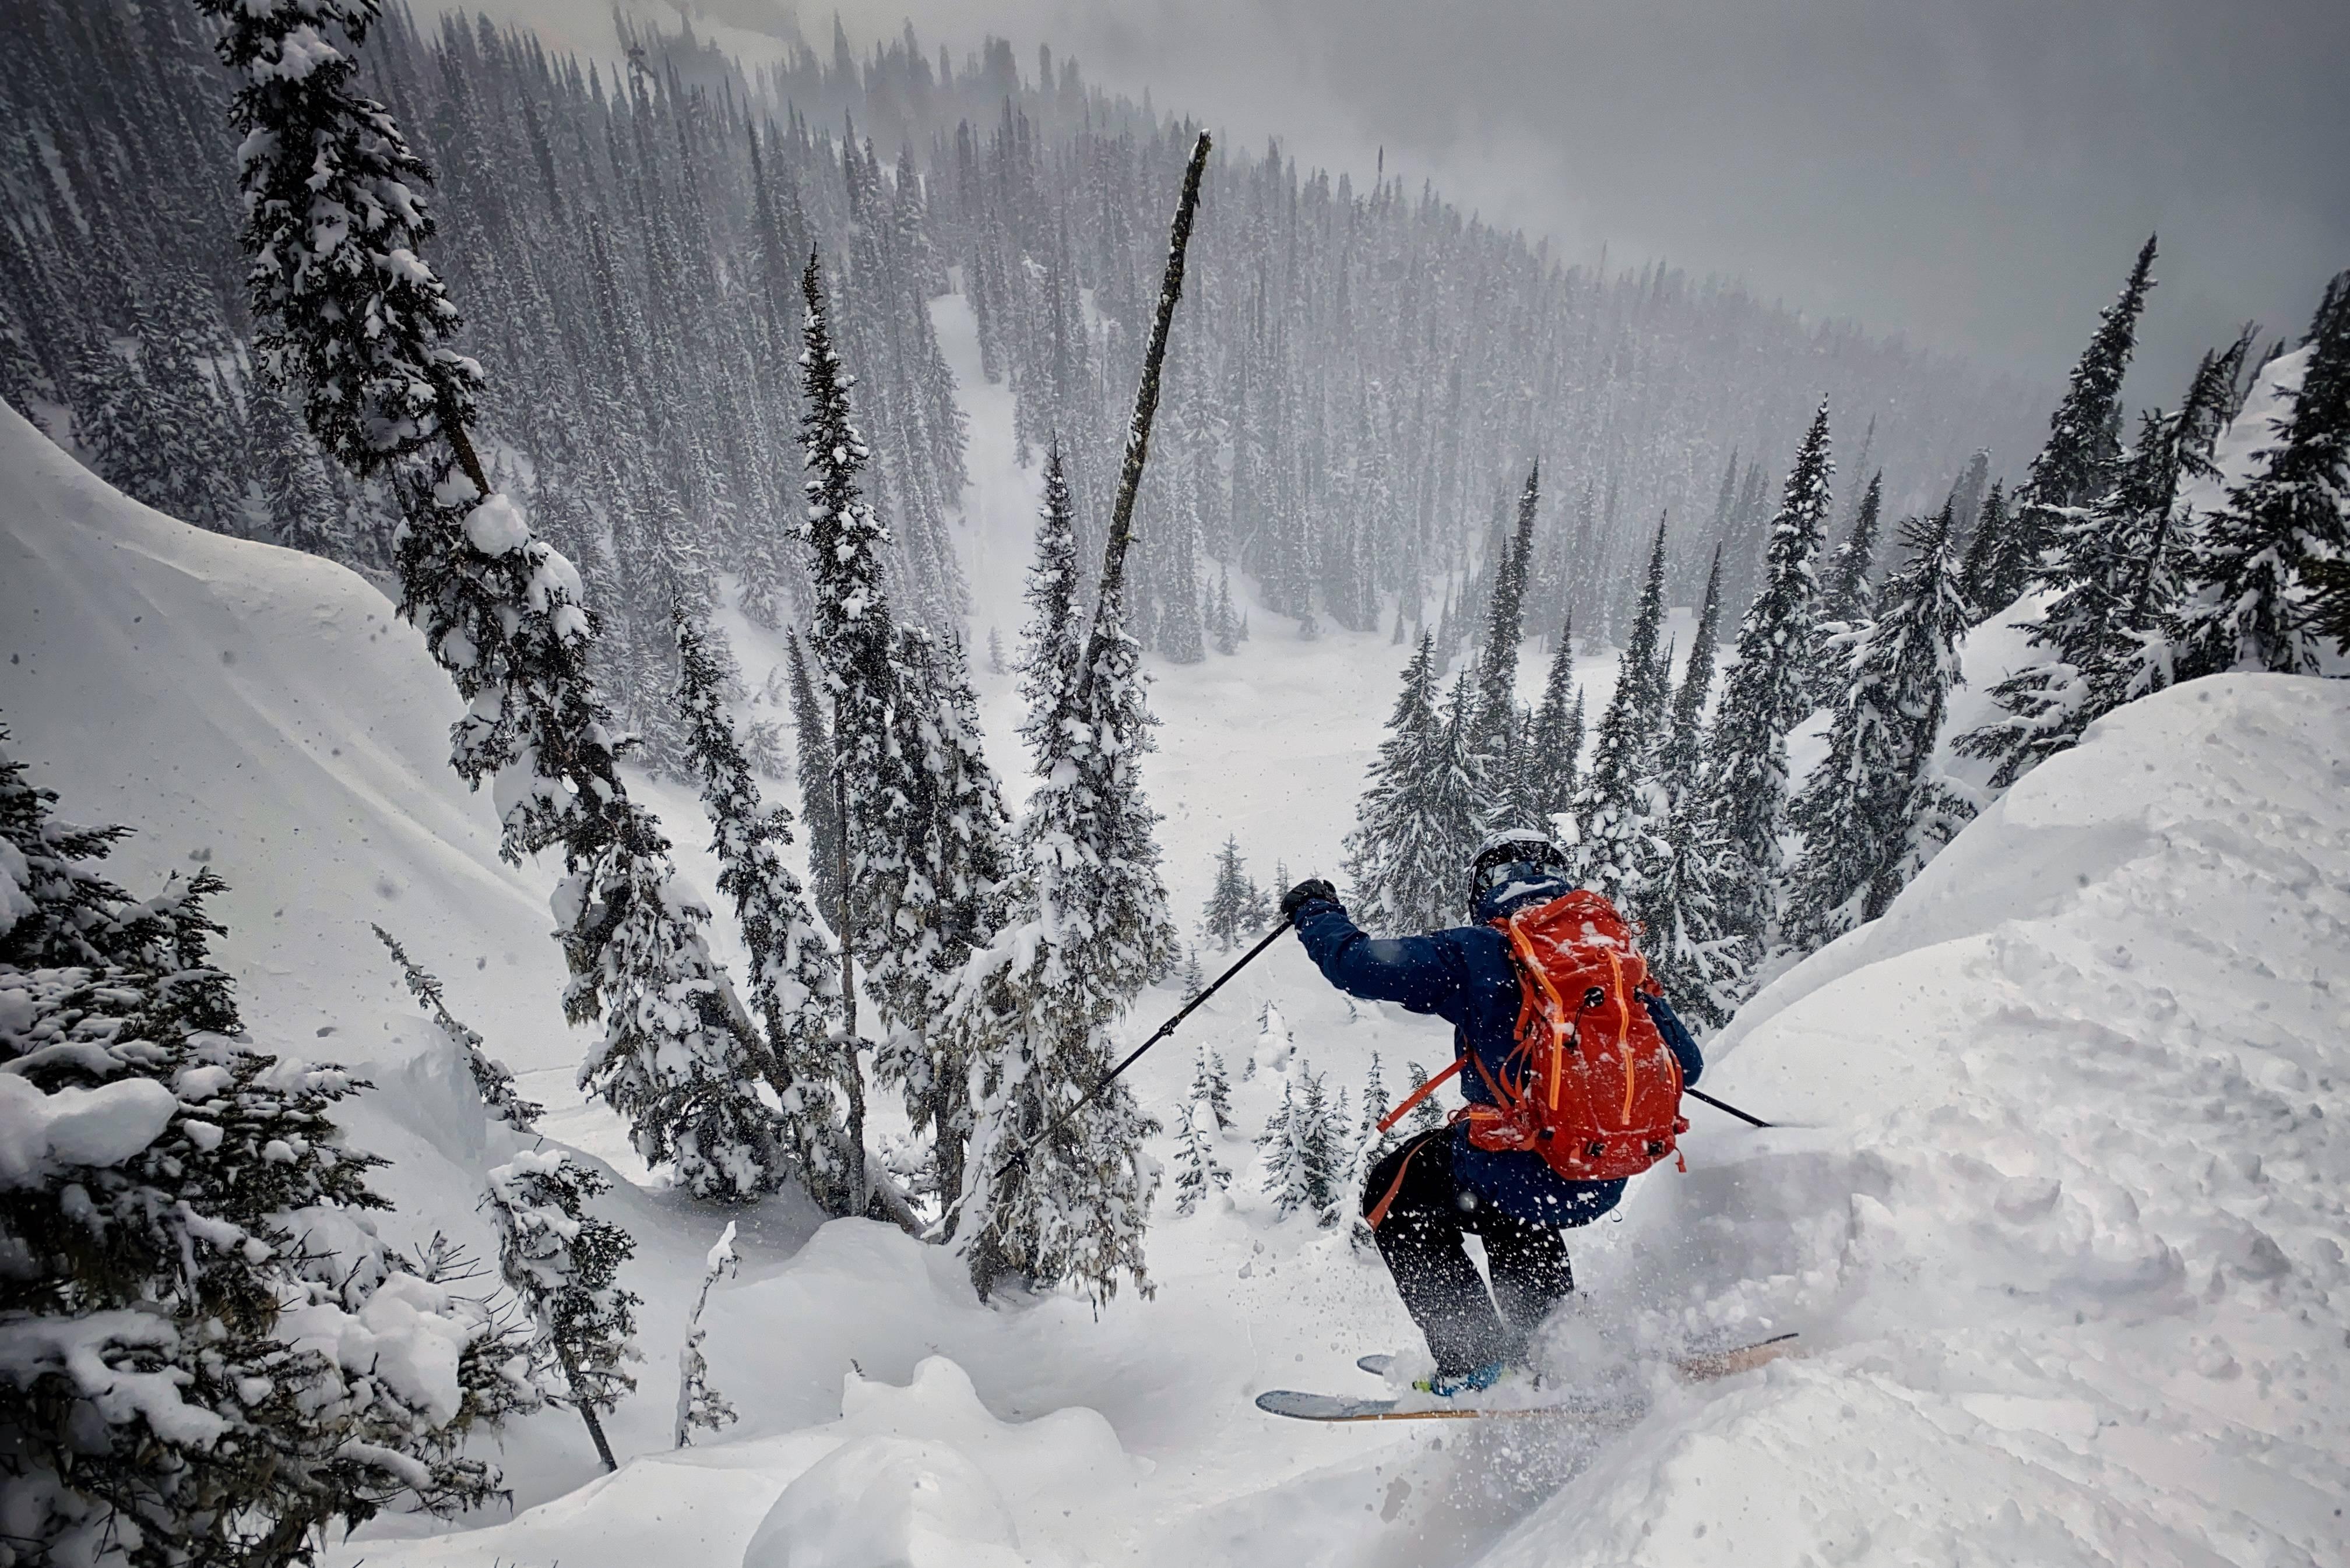 Salomon Backcountry skier